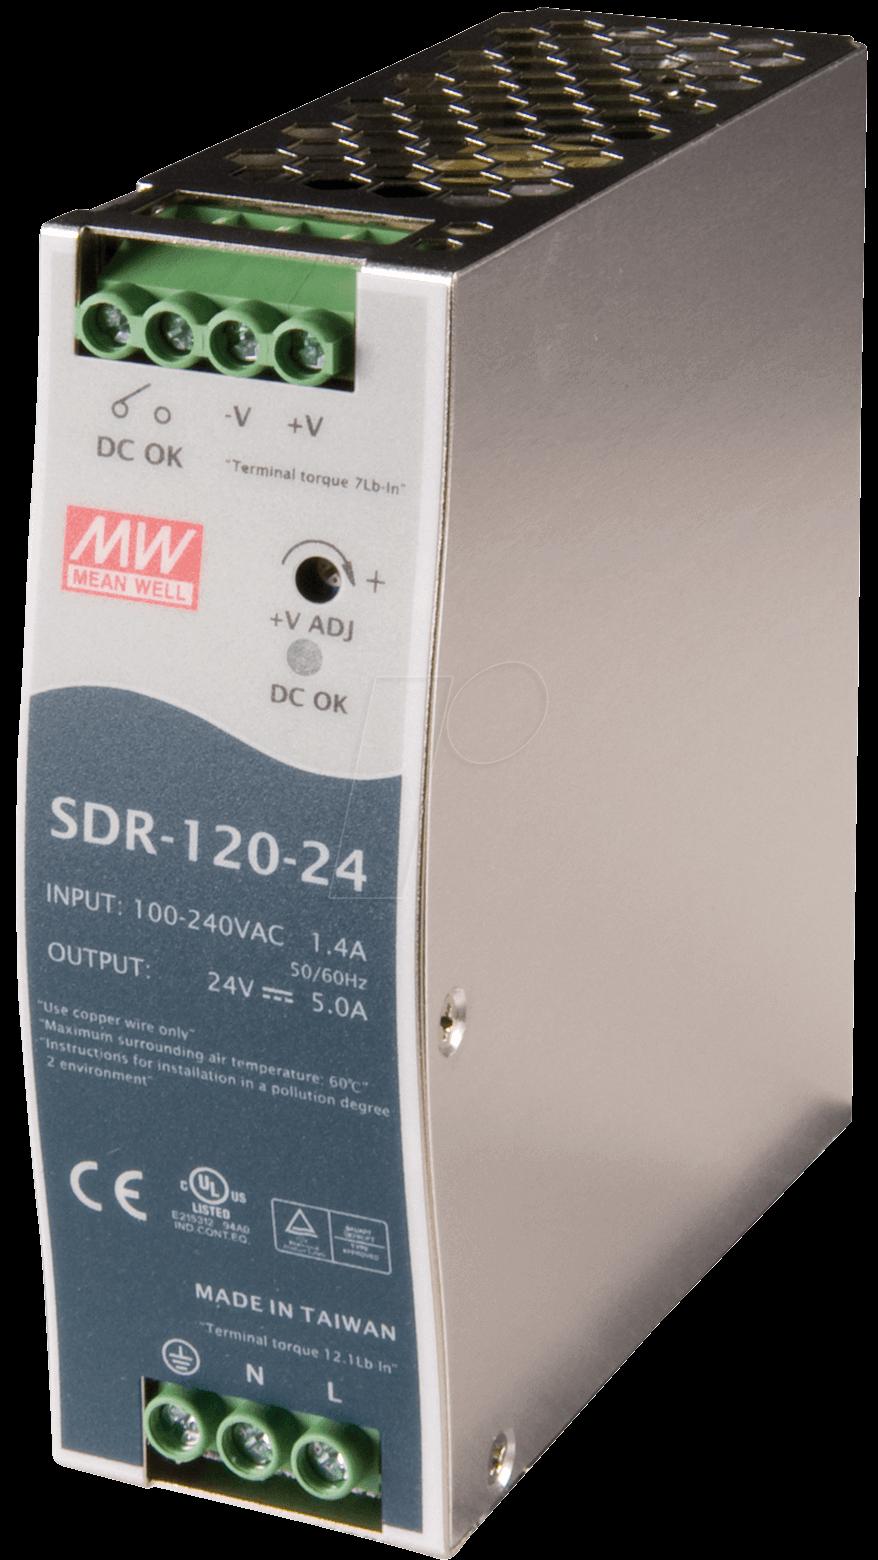 SNT MW-SDR120-12 - Schaltnetzteil, DIN-Montage, 120W / 12V / 10A